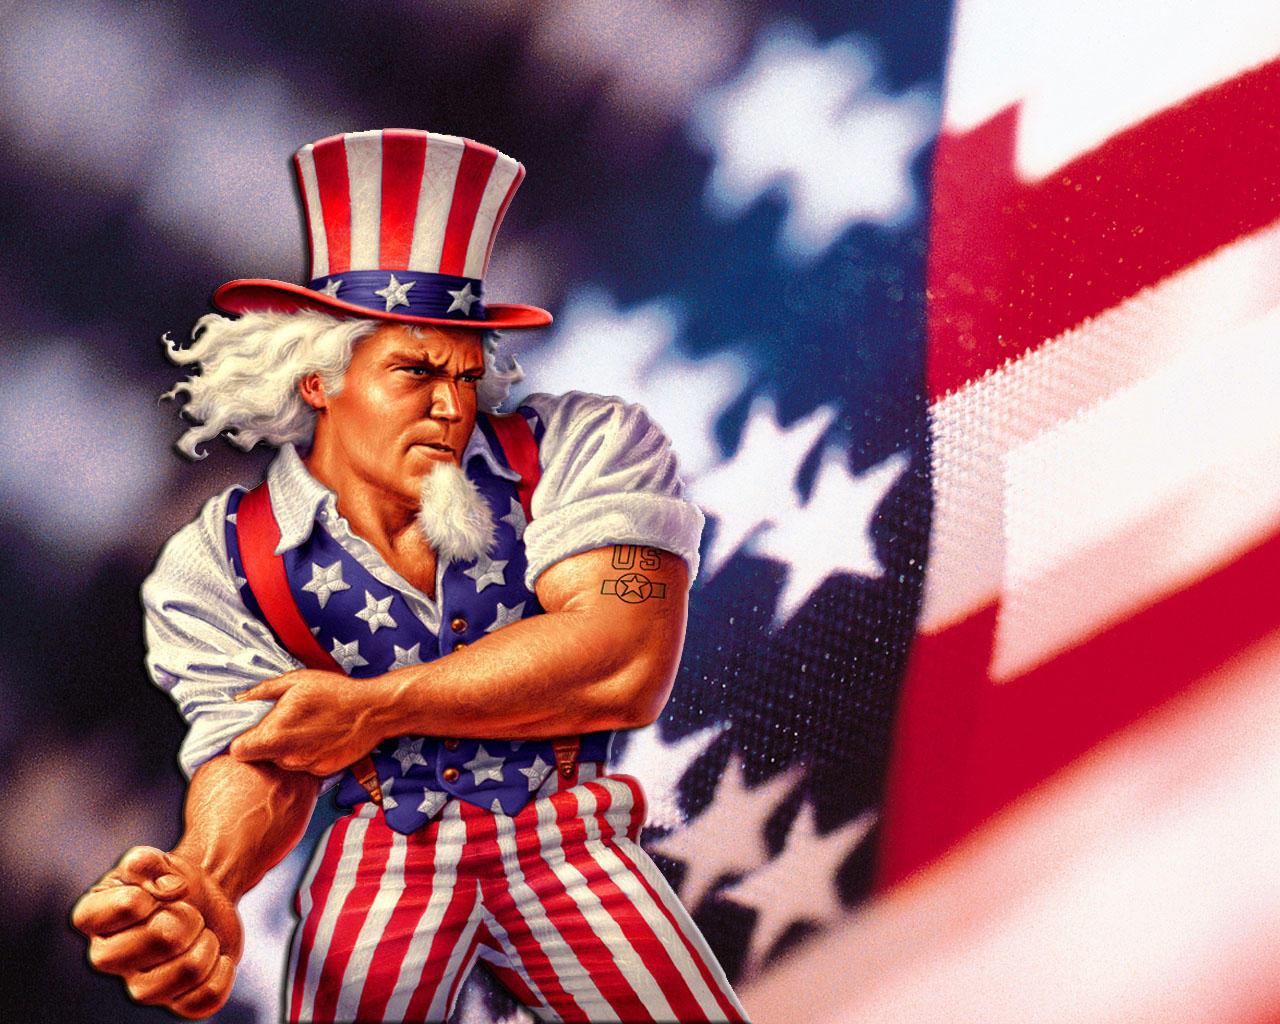 Uncle Sam Wallpaper | Best Wallpaper HD